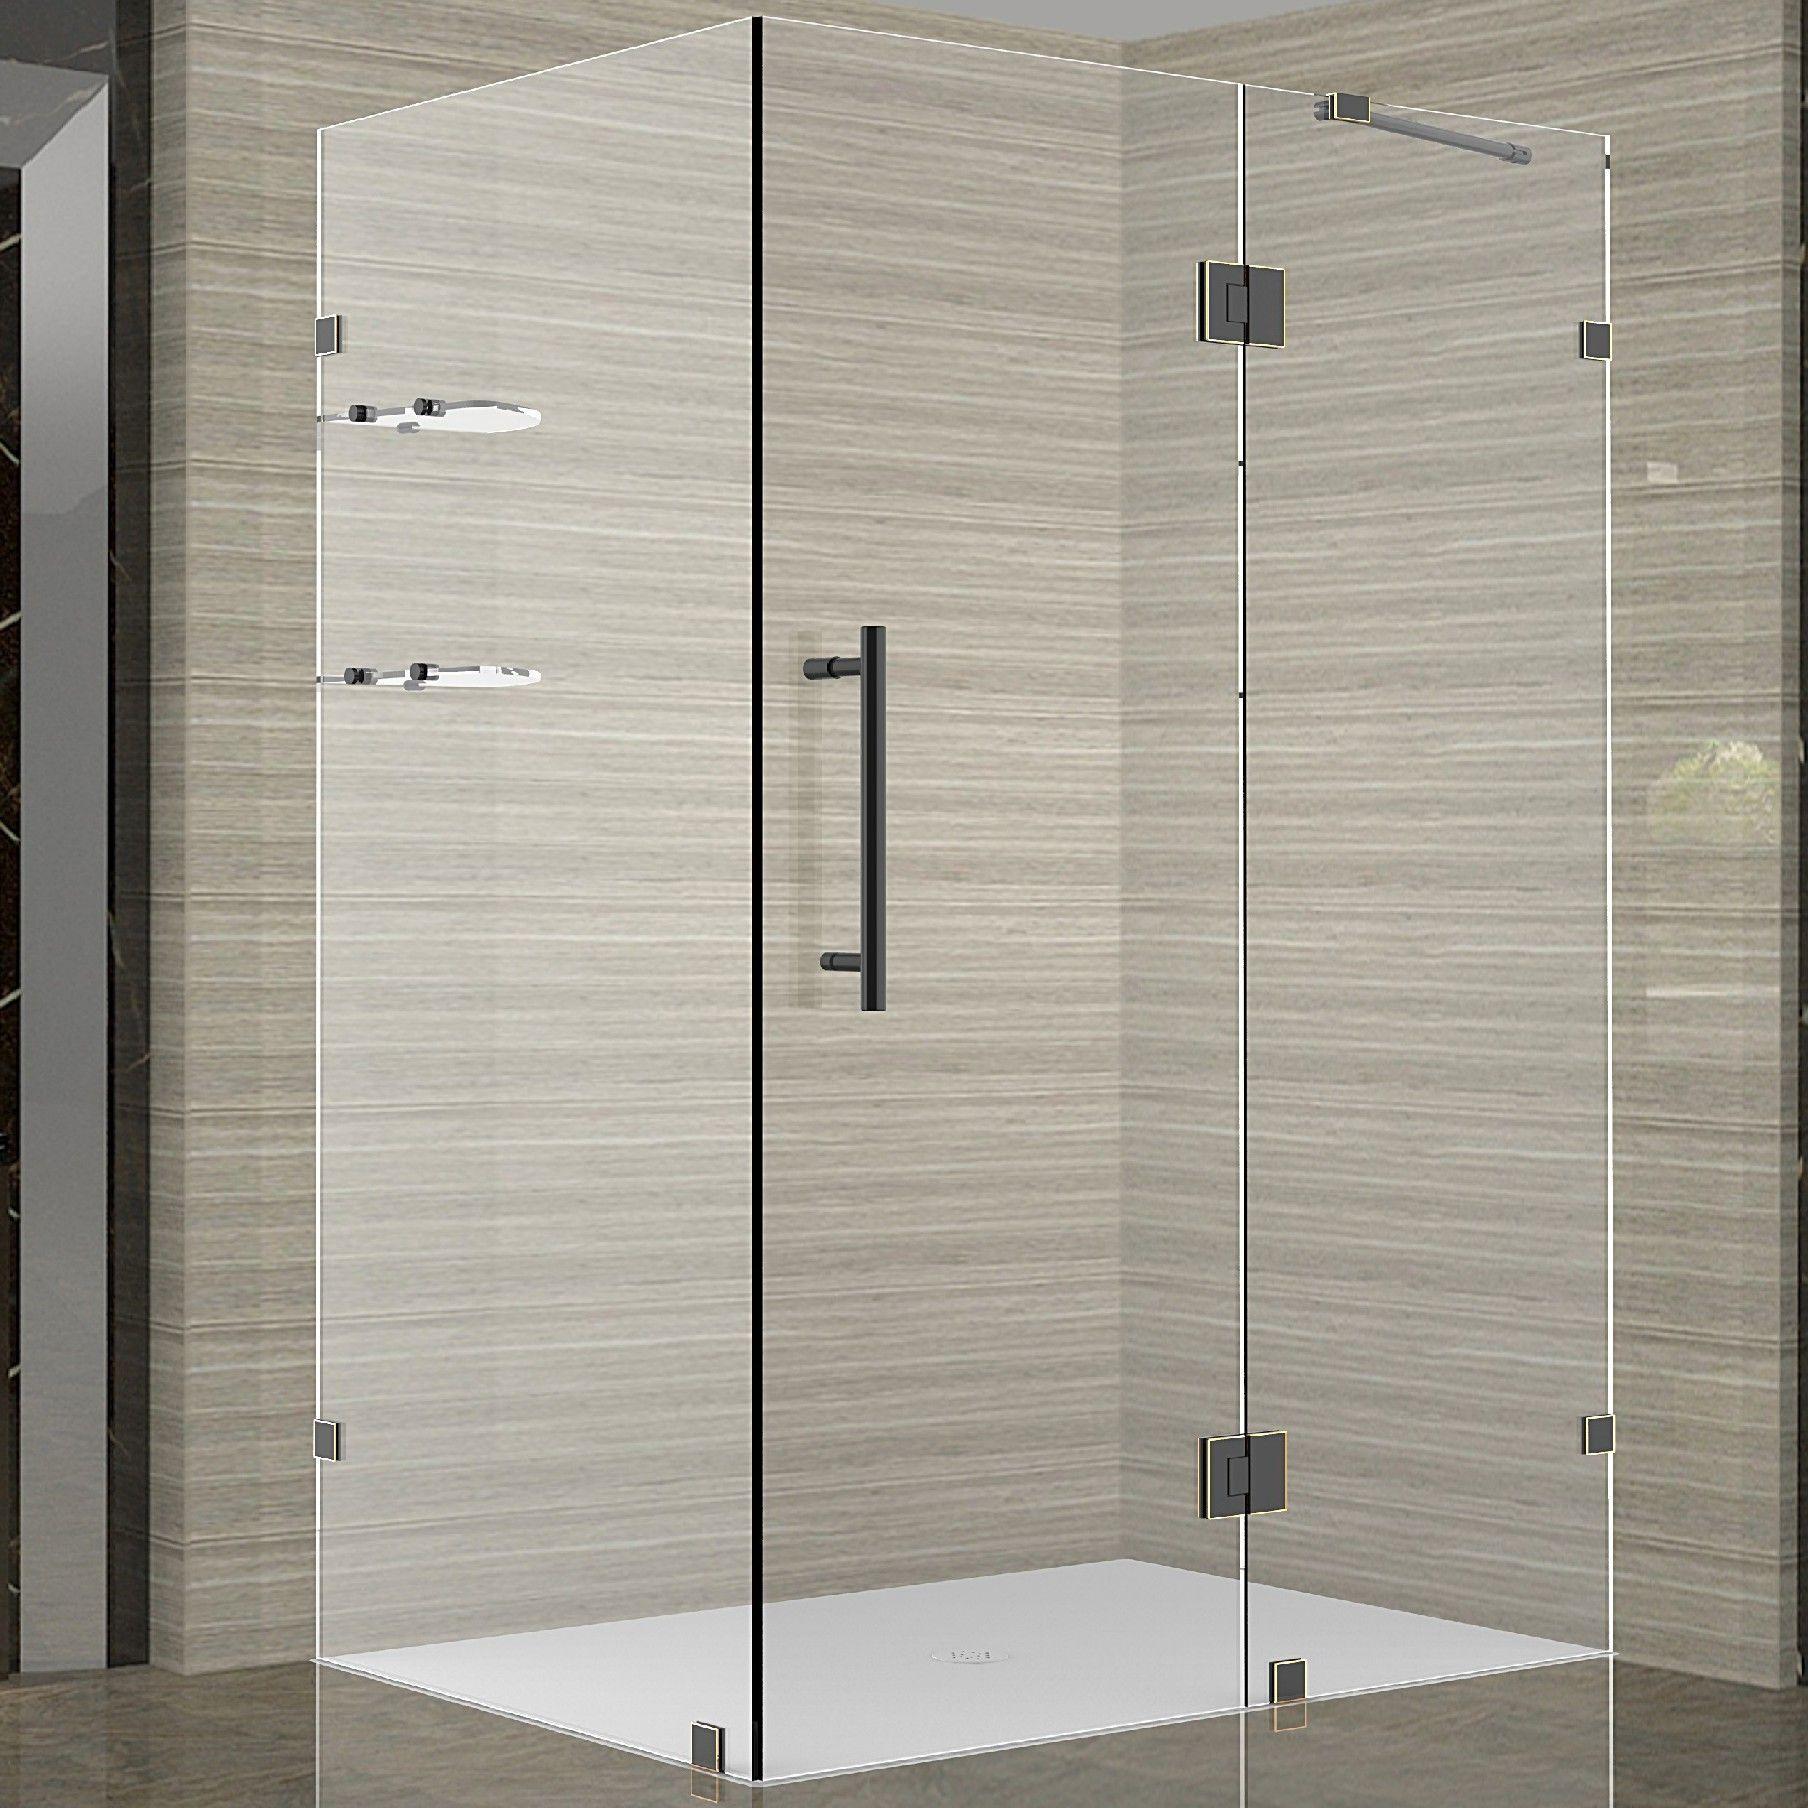 Avalux Gs 42 X 72 Square Hinged Shower Enclosure Frameless Shower Enclosures Shower Enclosure Neo Angle Shower Enclosures